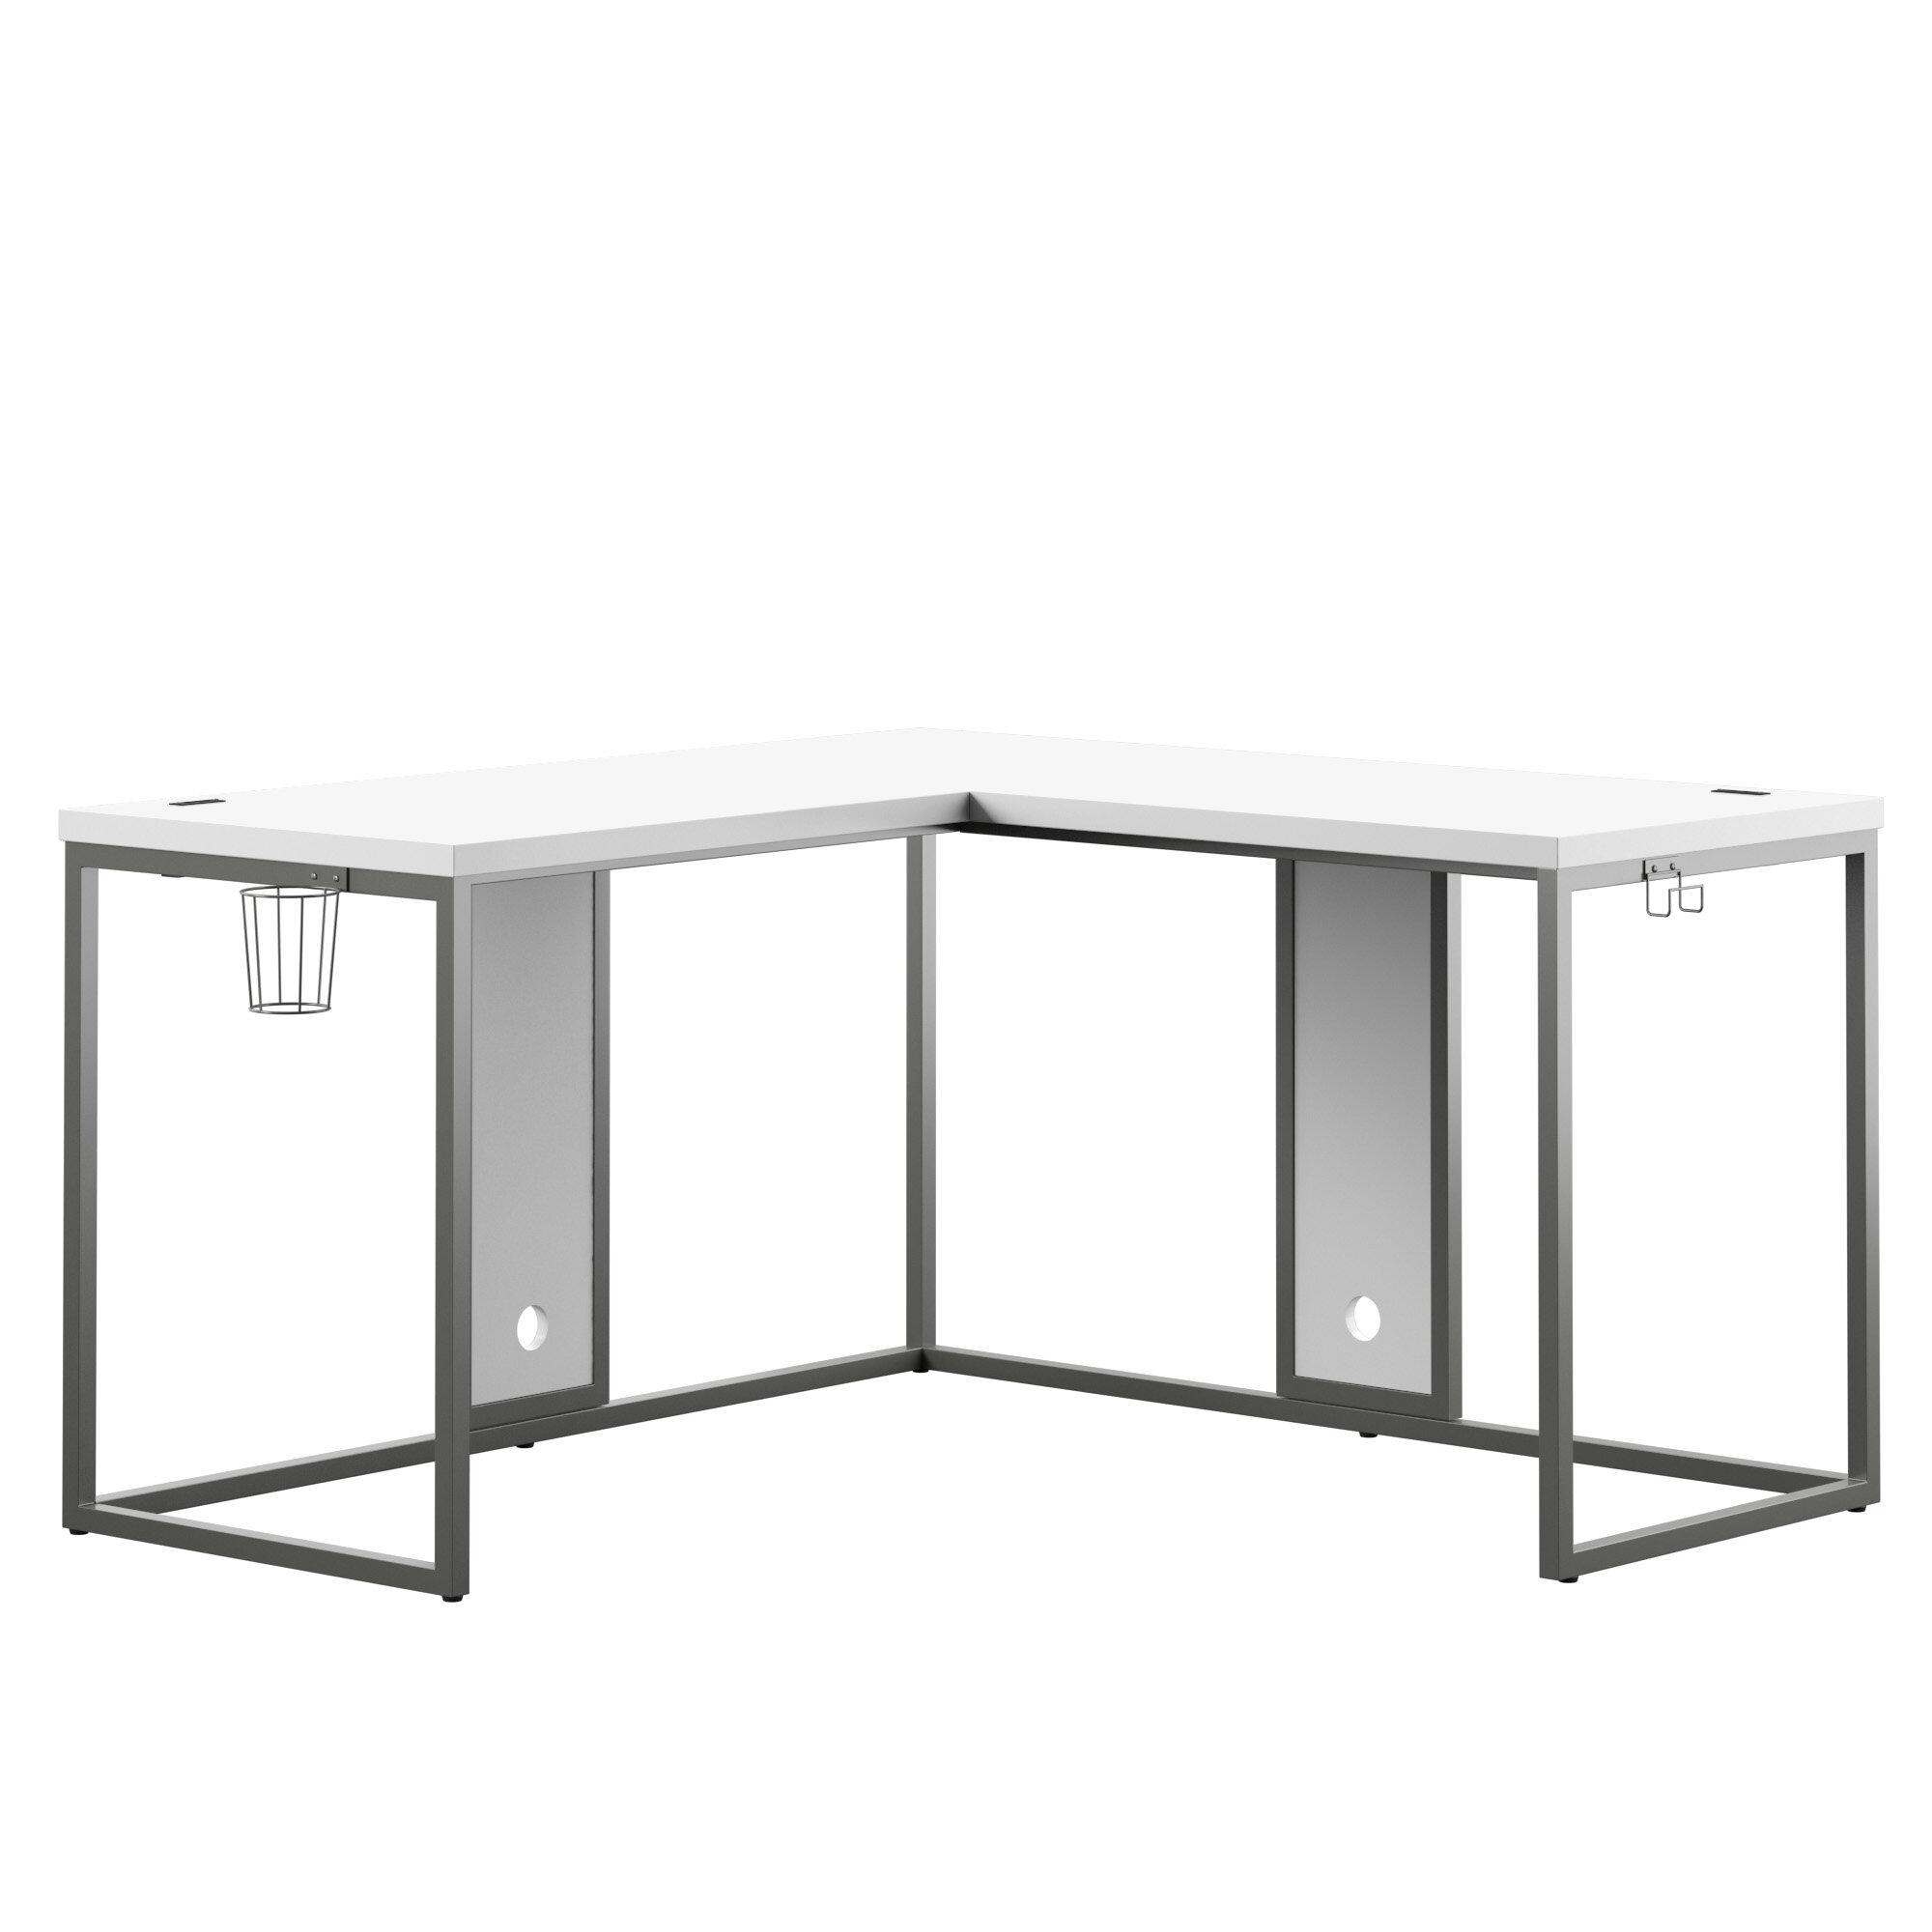 L Shaped Desks Up To 50 Off Through 01 05